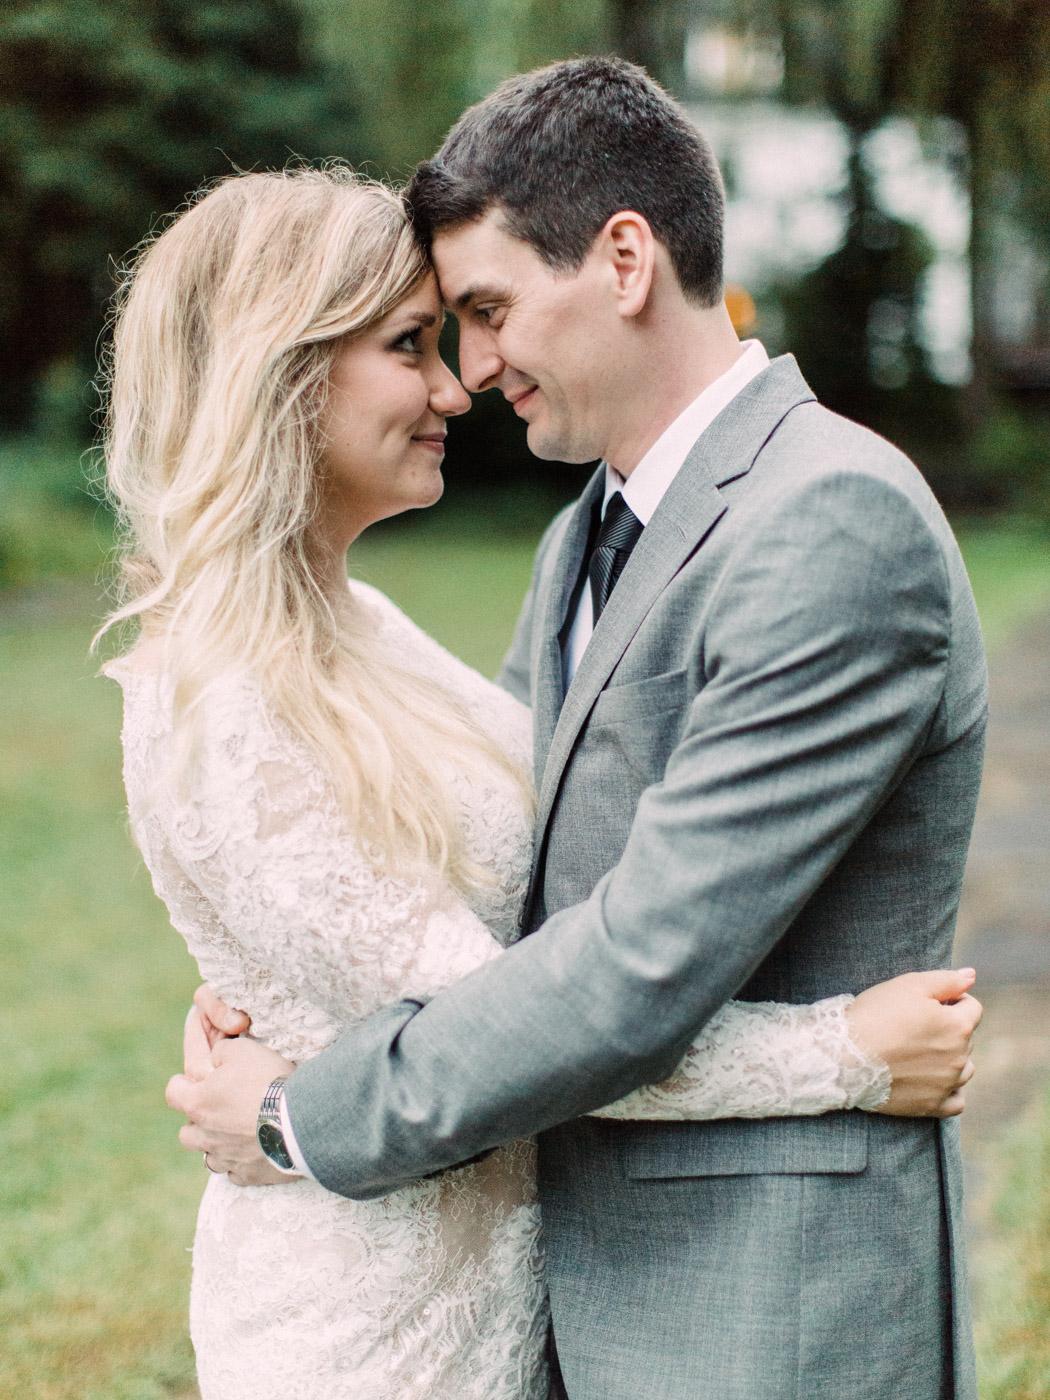 Toronto-wedding-photographer-intimate-classic-fine-art-elopement-ottawa86.jpg